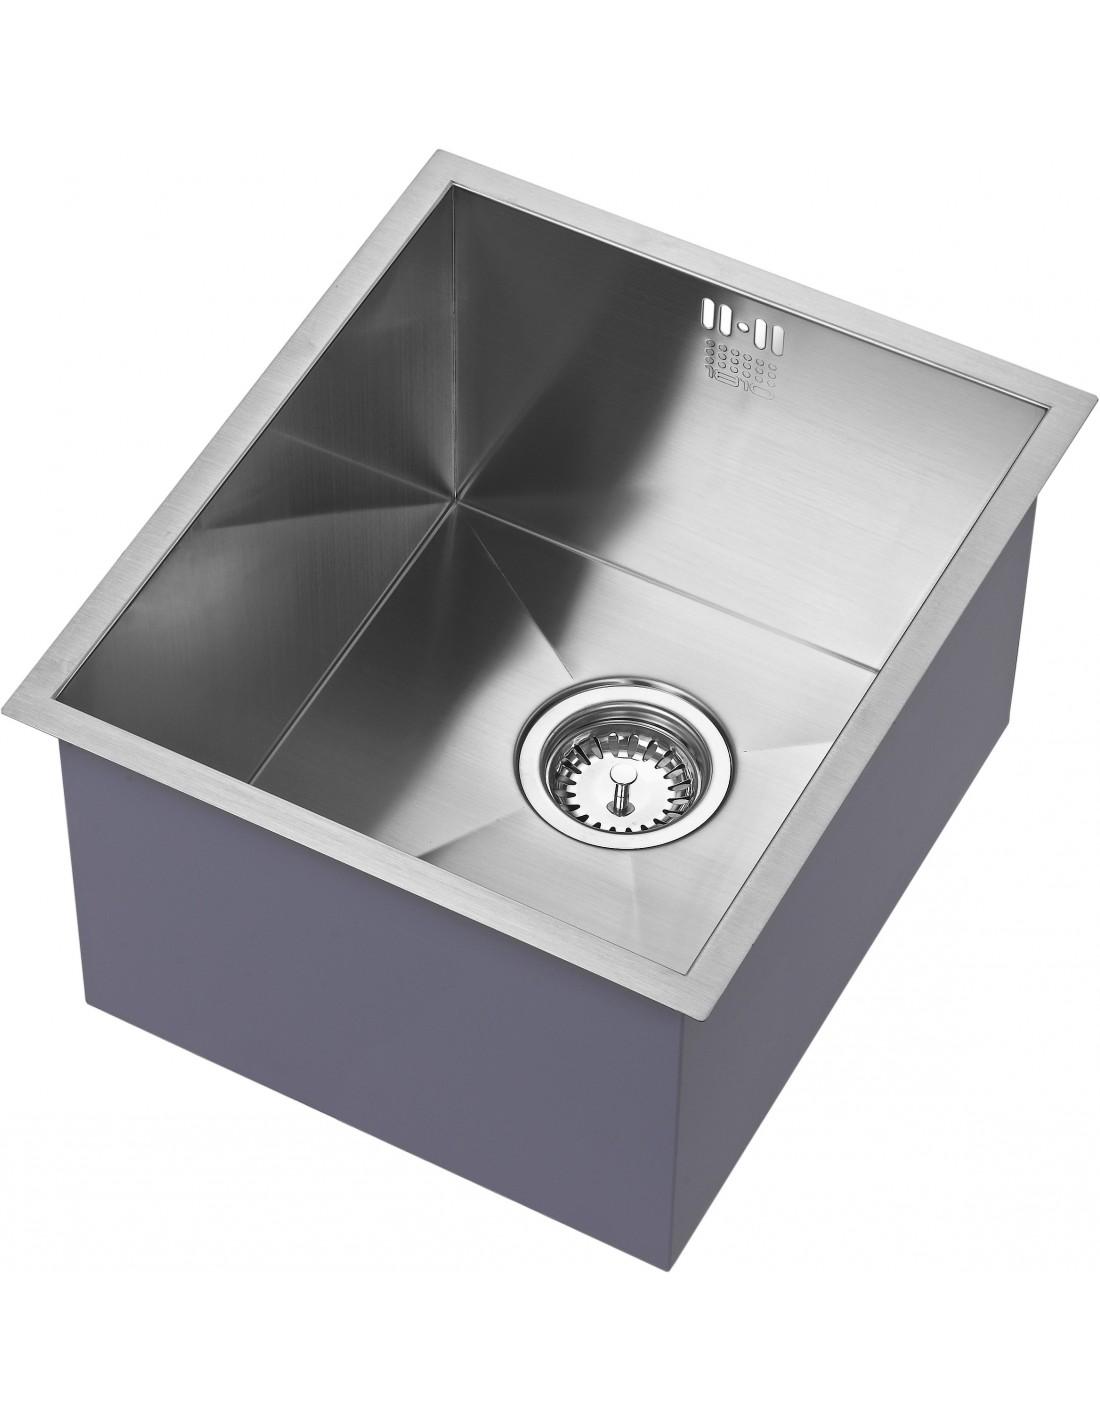 square kitchen sink kraftmaid zu 34 u s 018 1810 zenuno 340u single bowl undermount or inset sharp extra deep